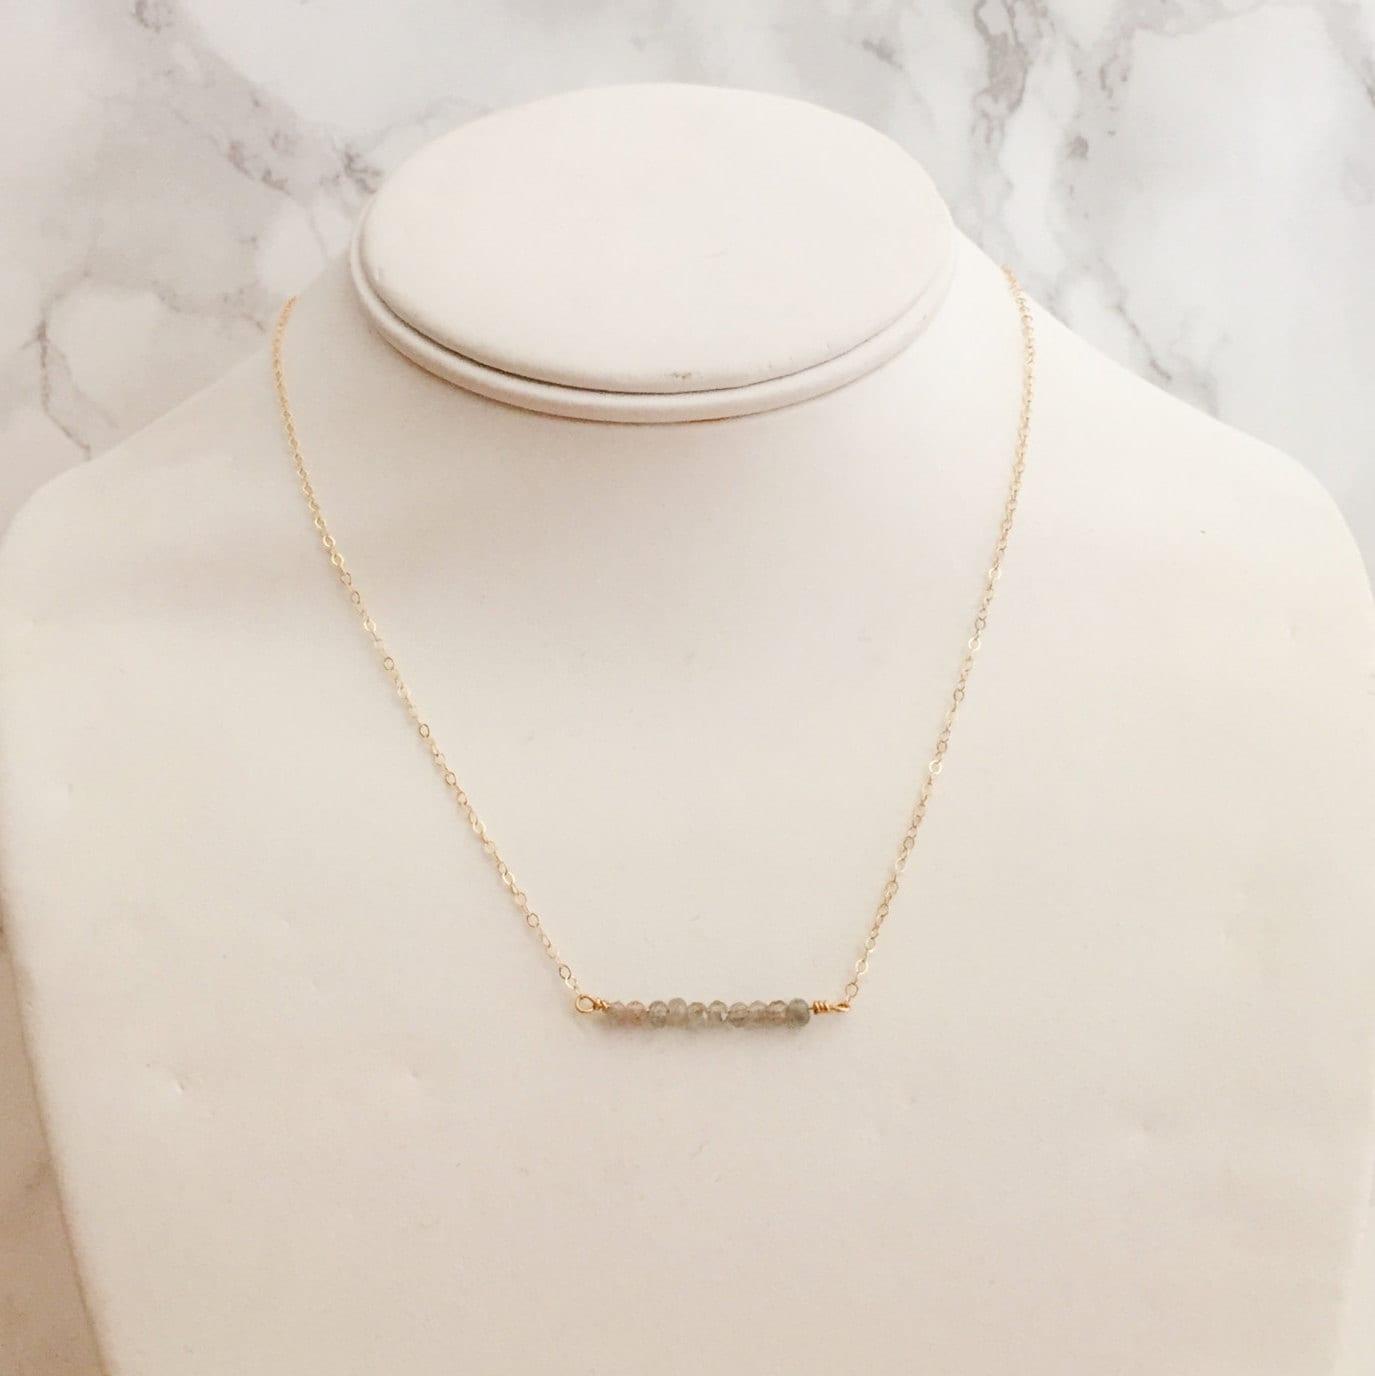 Dainty Semi-Precious Beaded Gemstone Necklace - Gray Labradorite